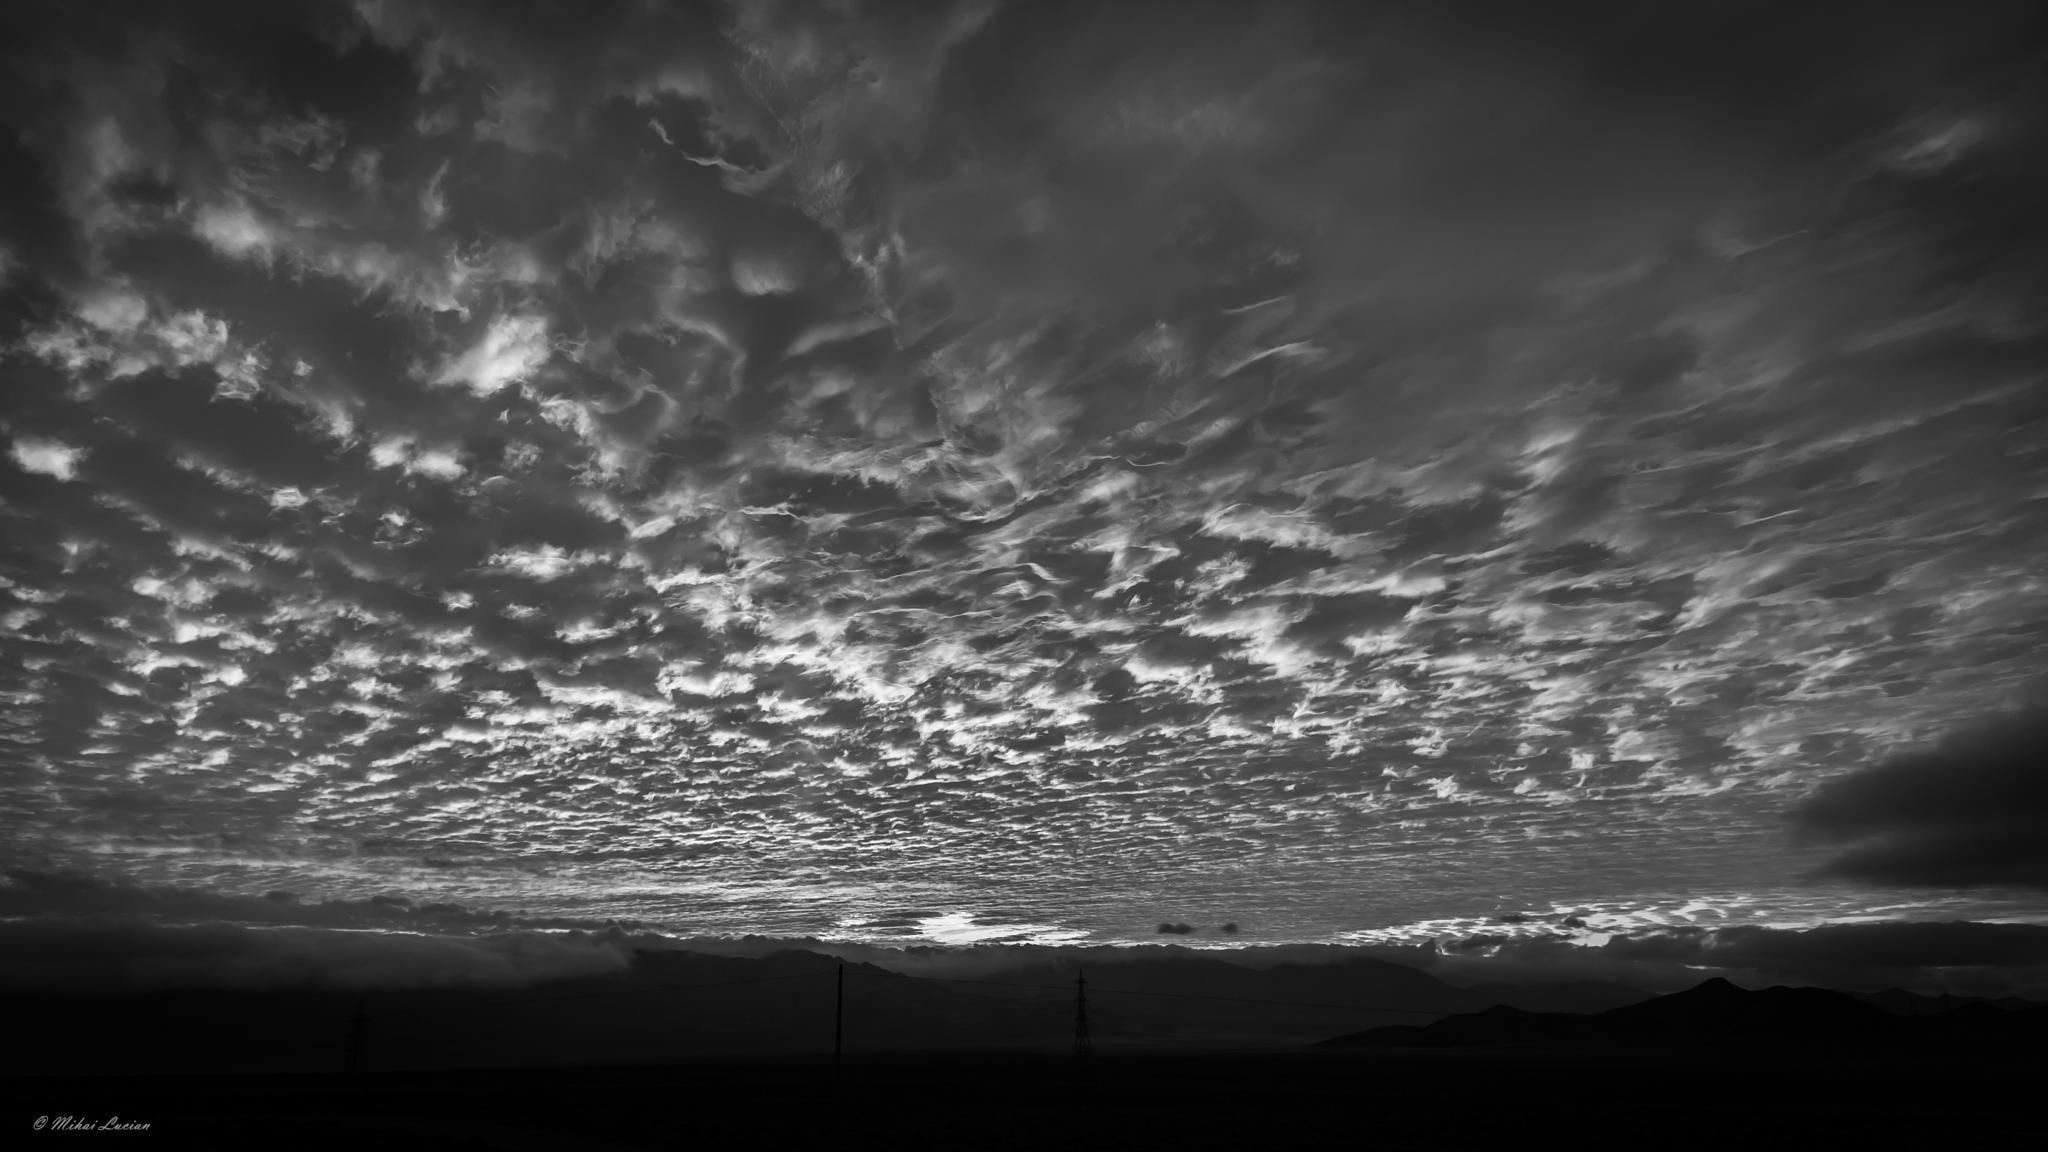 # unbelievable sunset  by Mihai Lucian